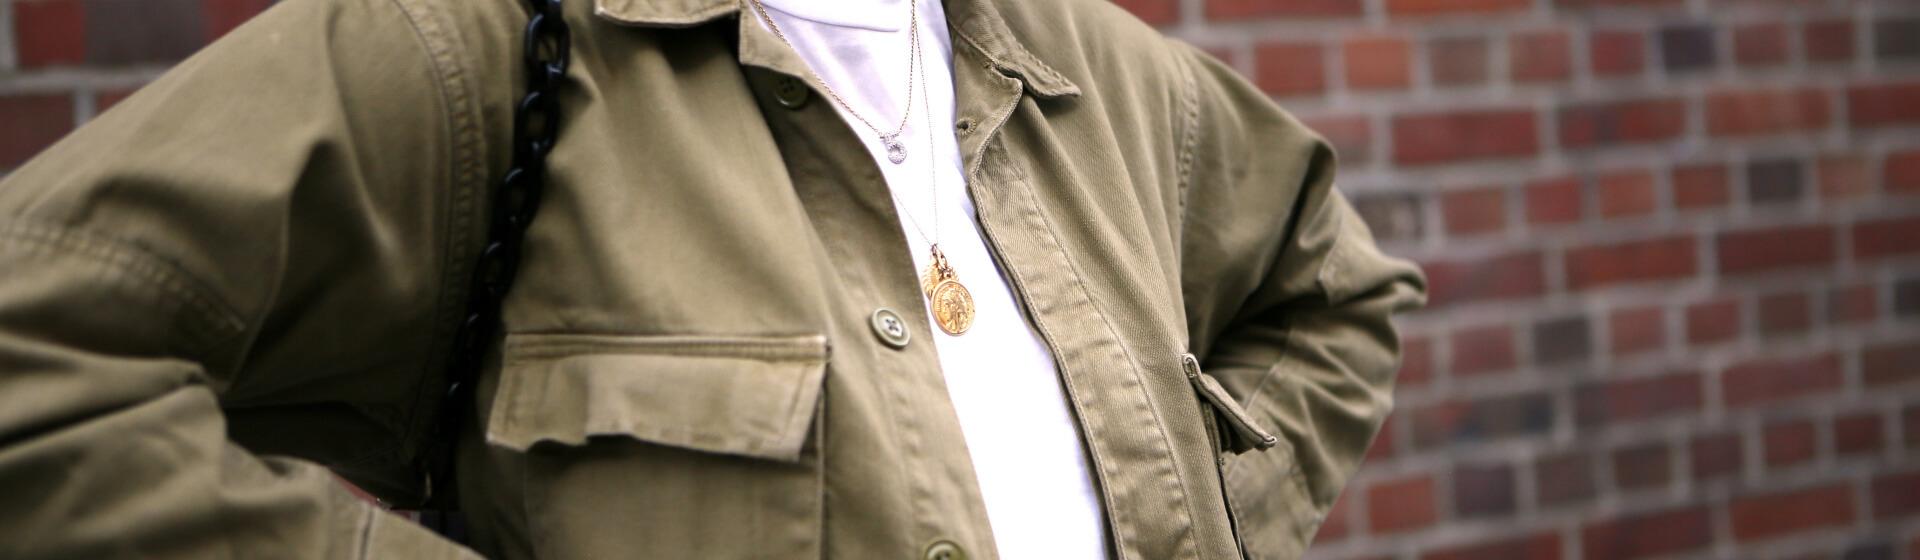 Outfit mit Utlitliy Jacket